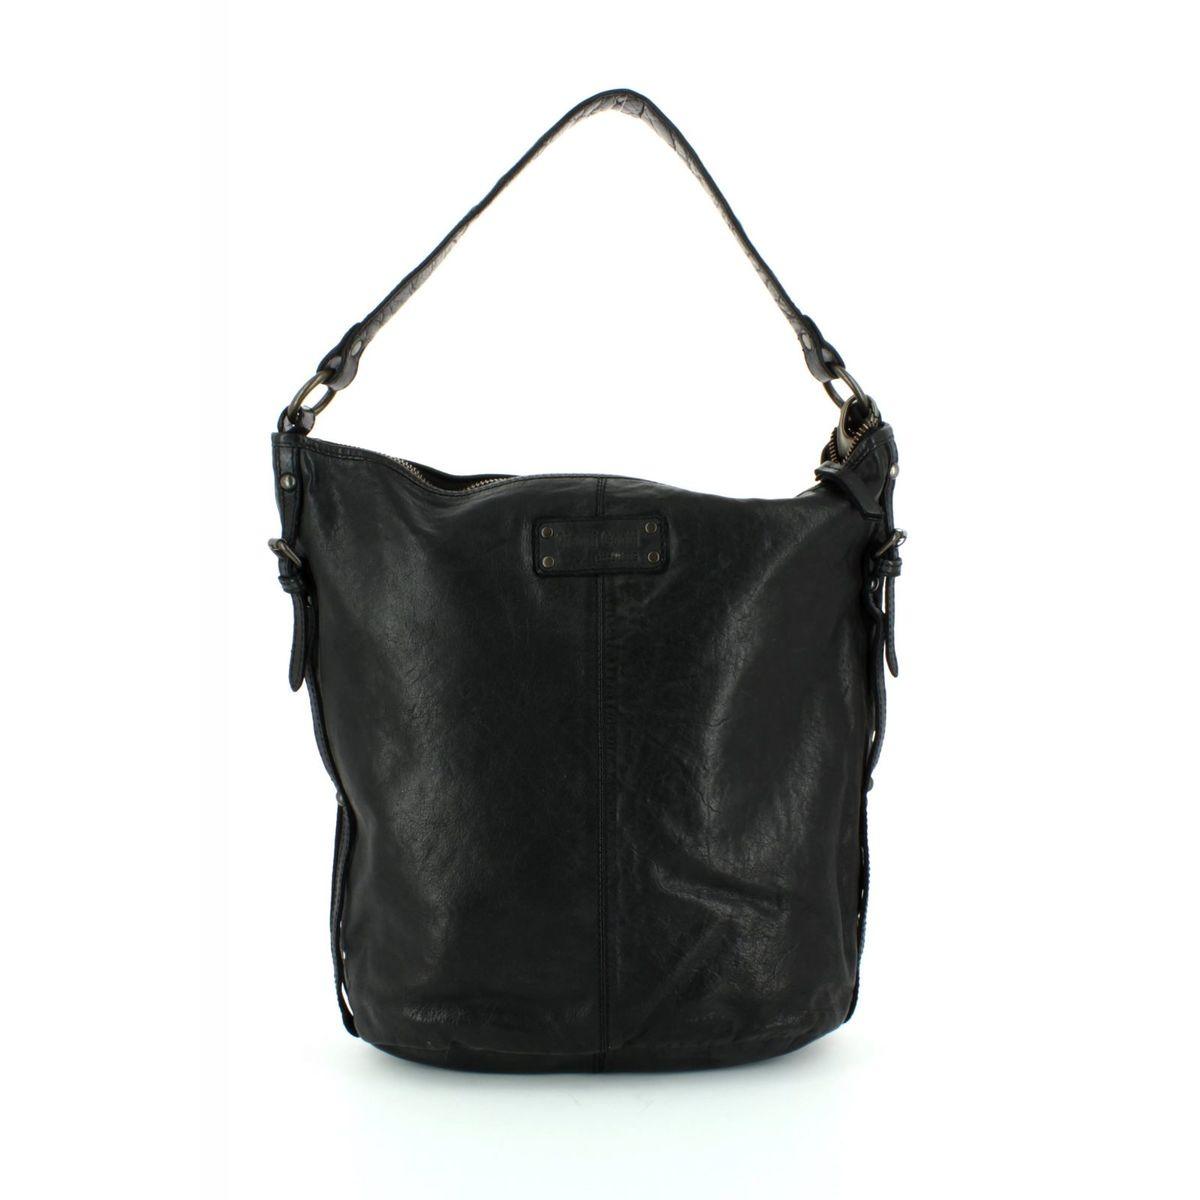 Gianni Conti Handbag Black 4203354 10 Slouchy